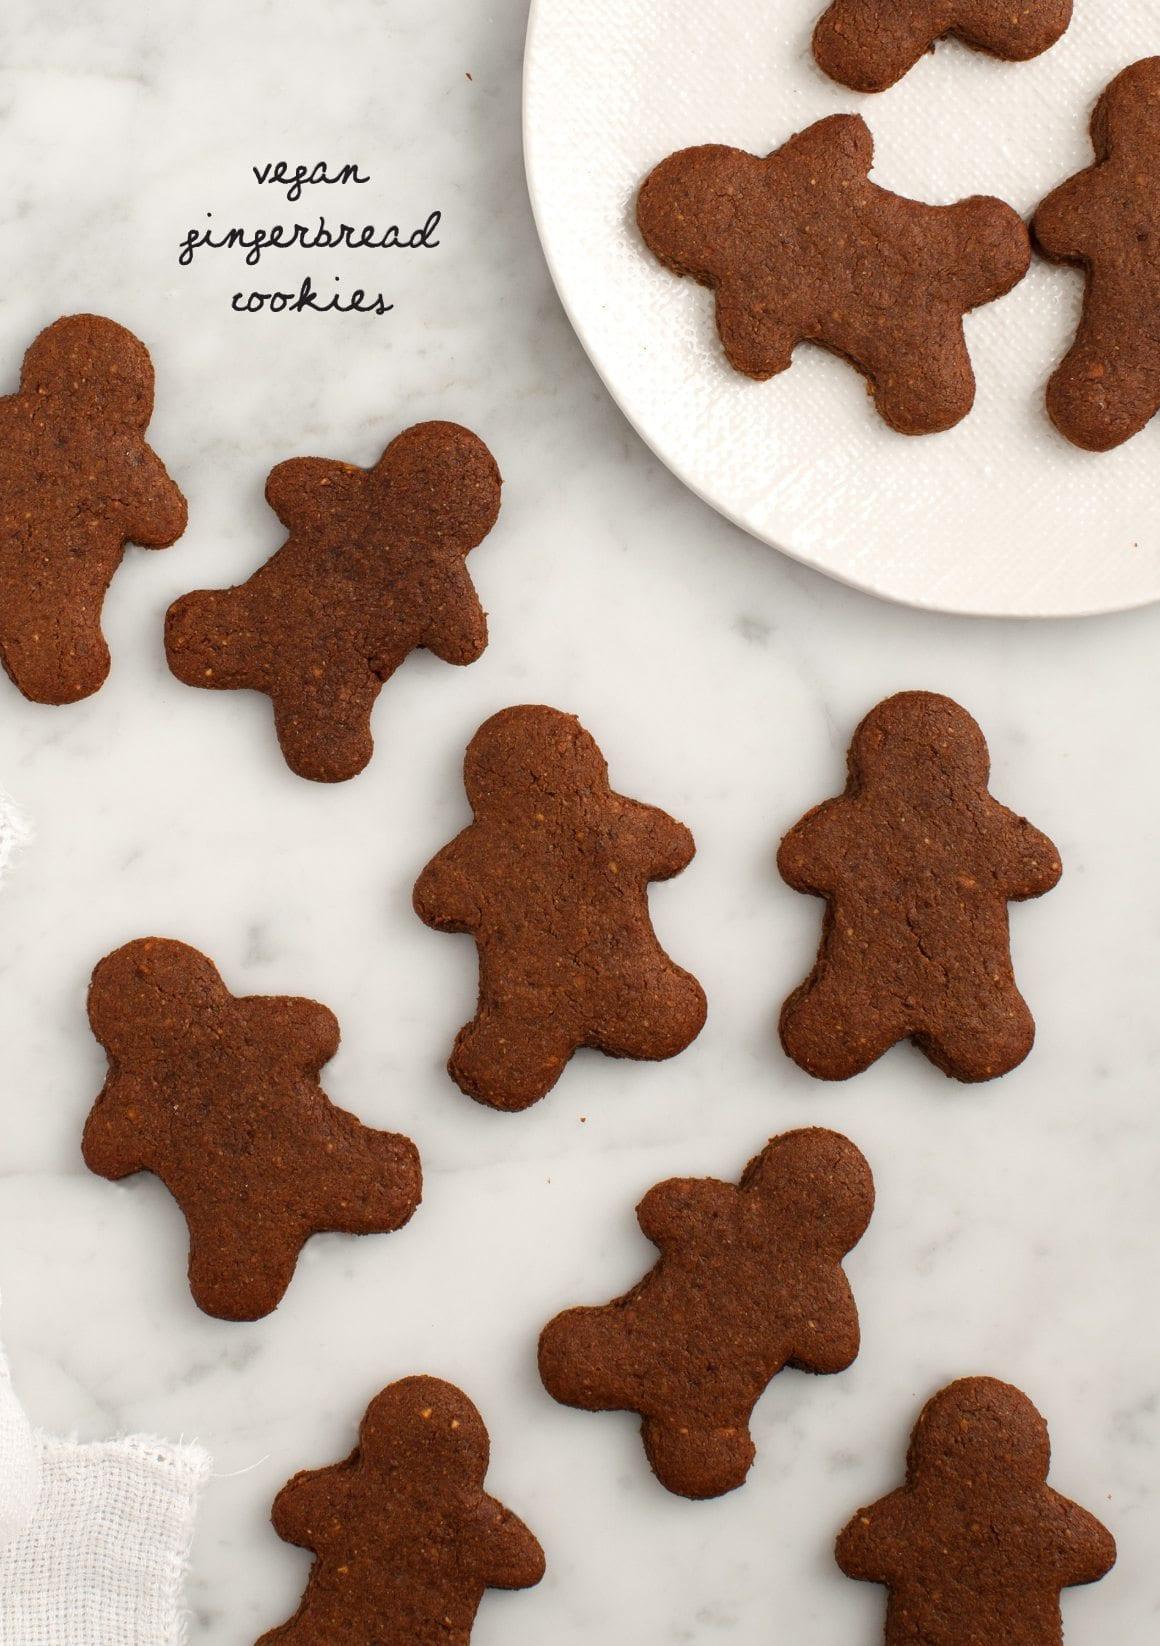 Vegan Gingerbread Cookies  Vegan Gingerbread Cookies Recipe Love and Lemons